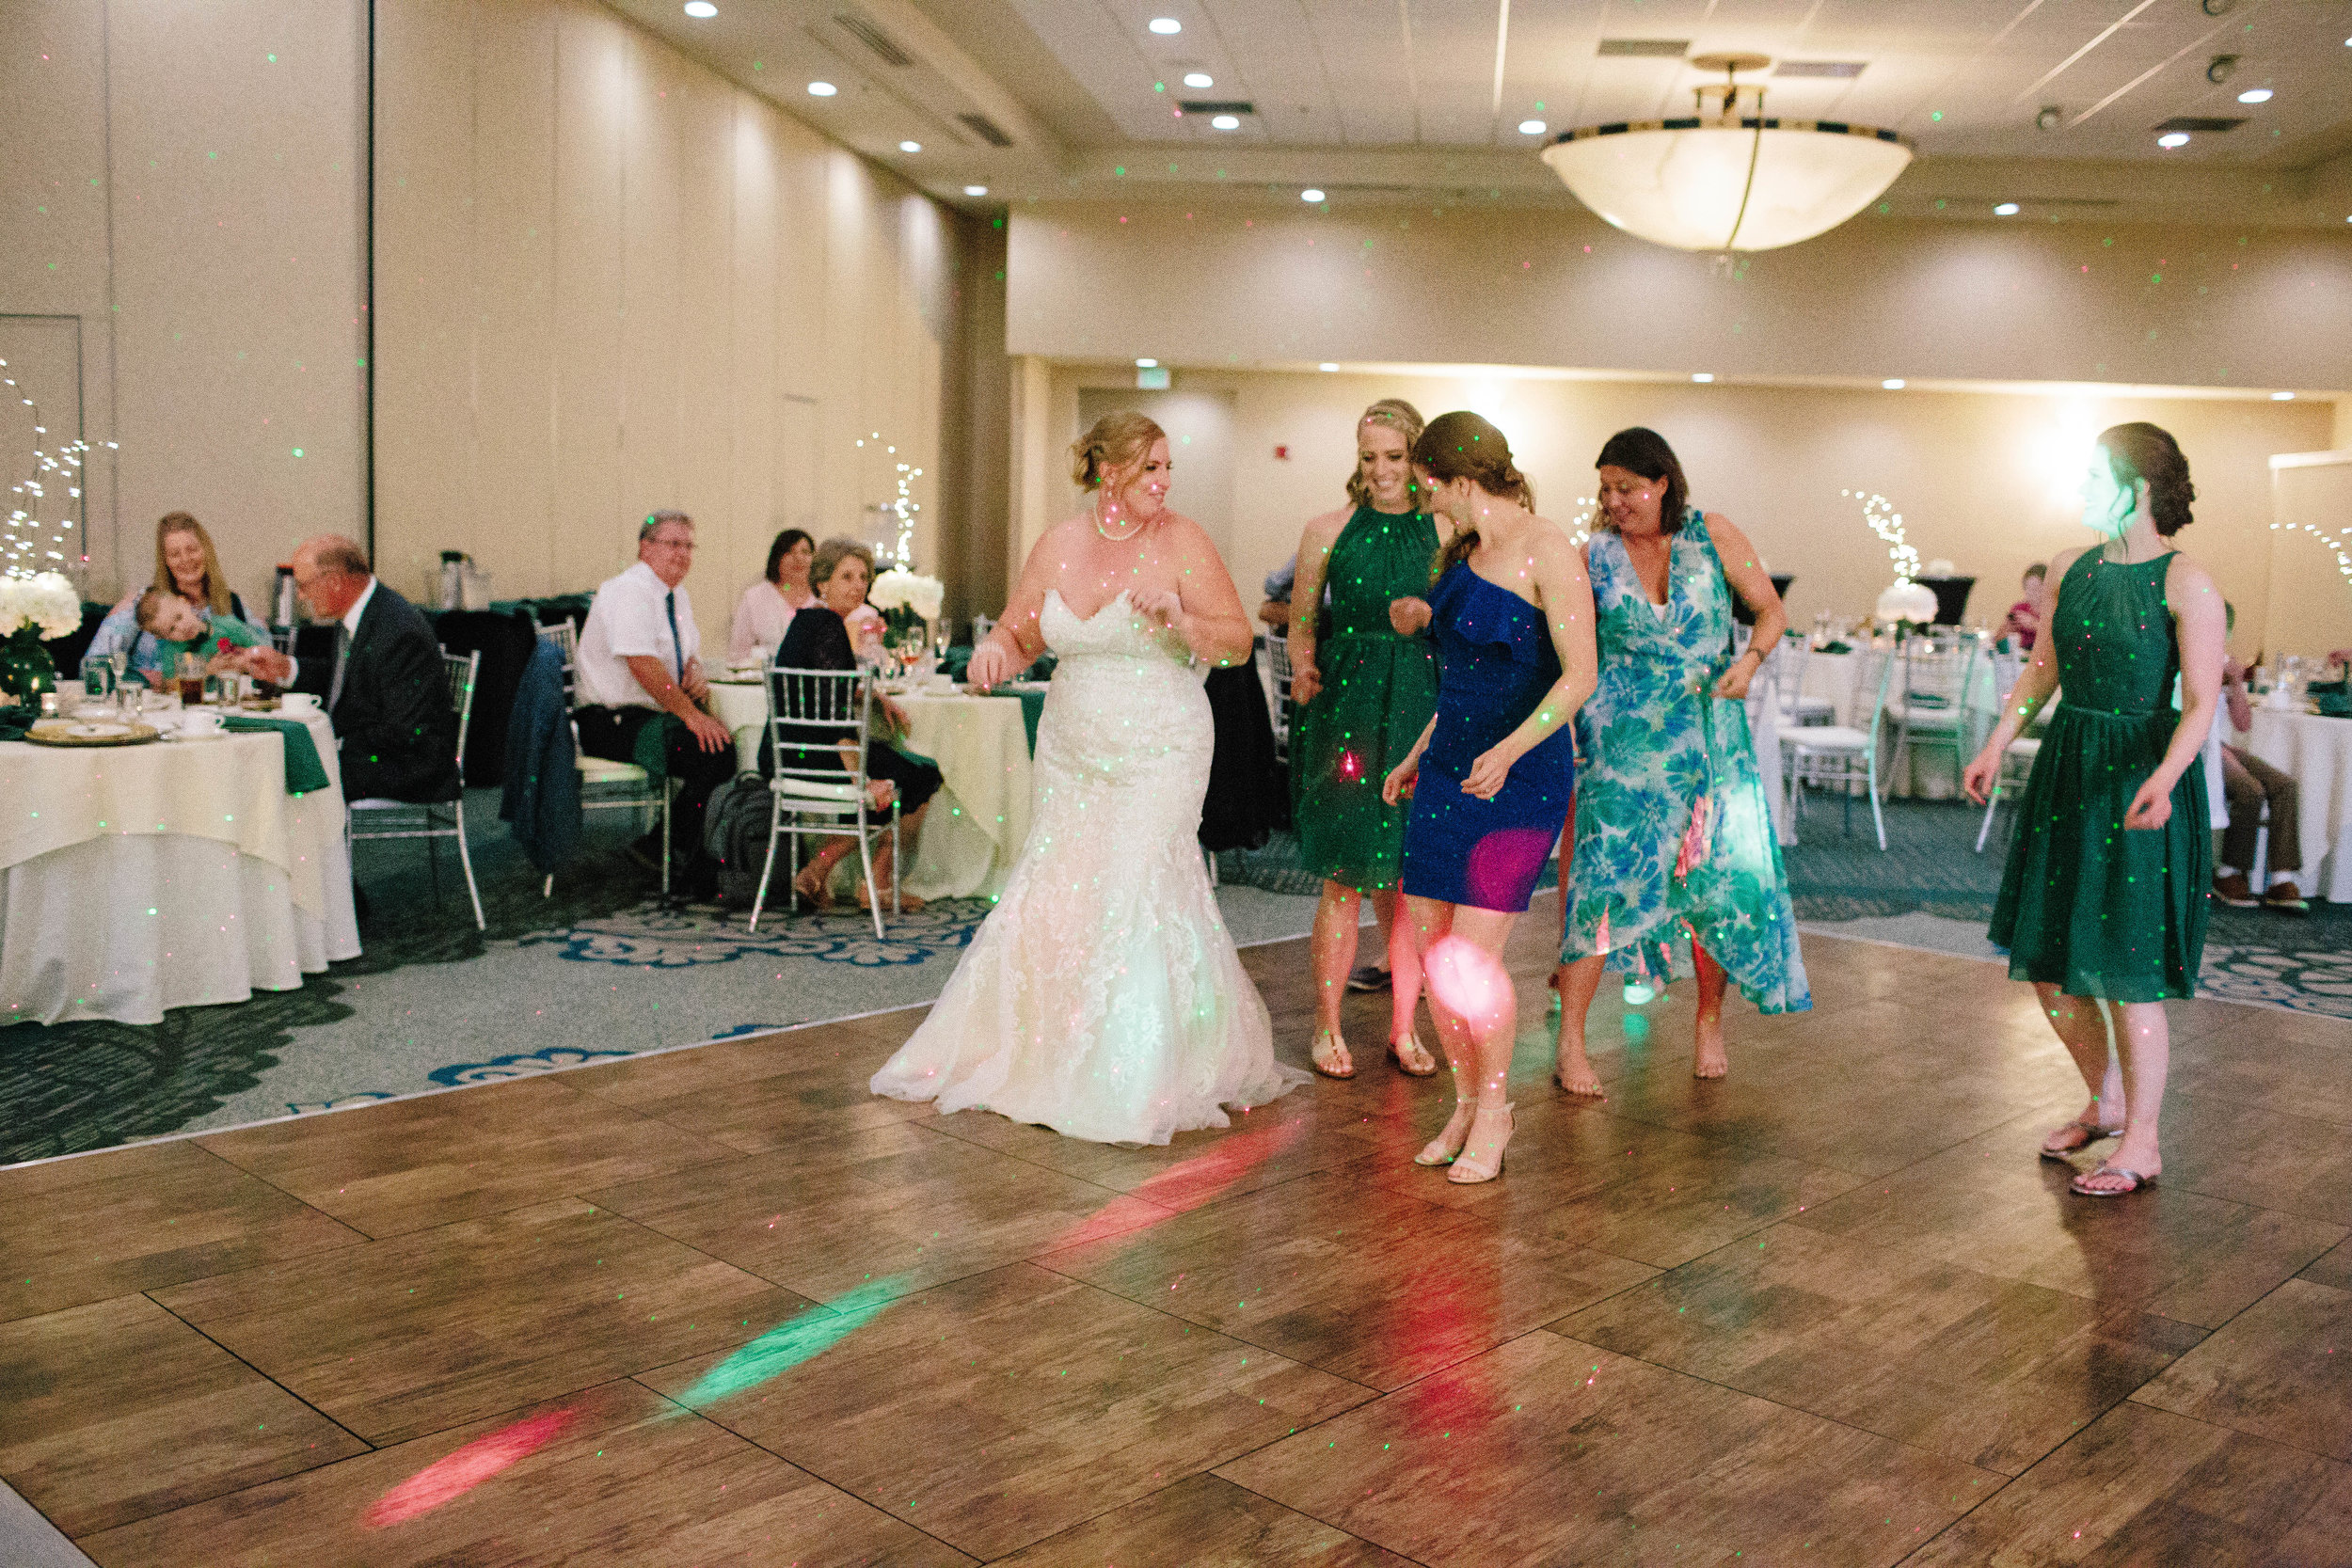 D2-Lydia-Rohan-Downtown-Boise-Wedding-76.jpg